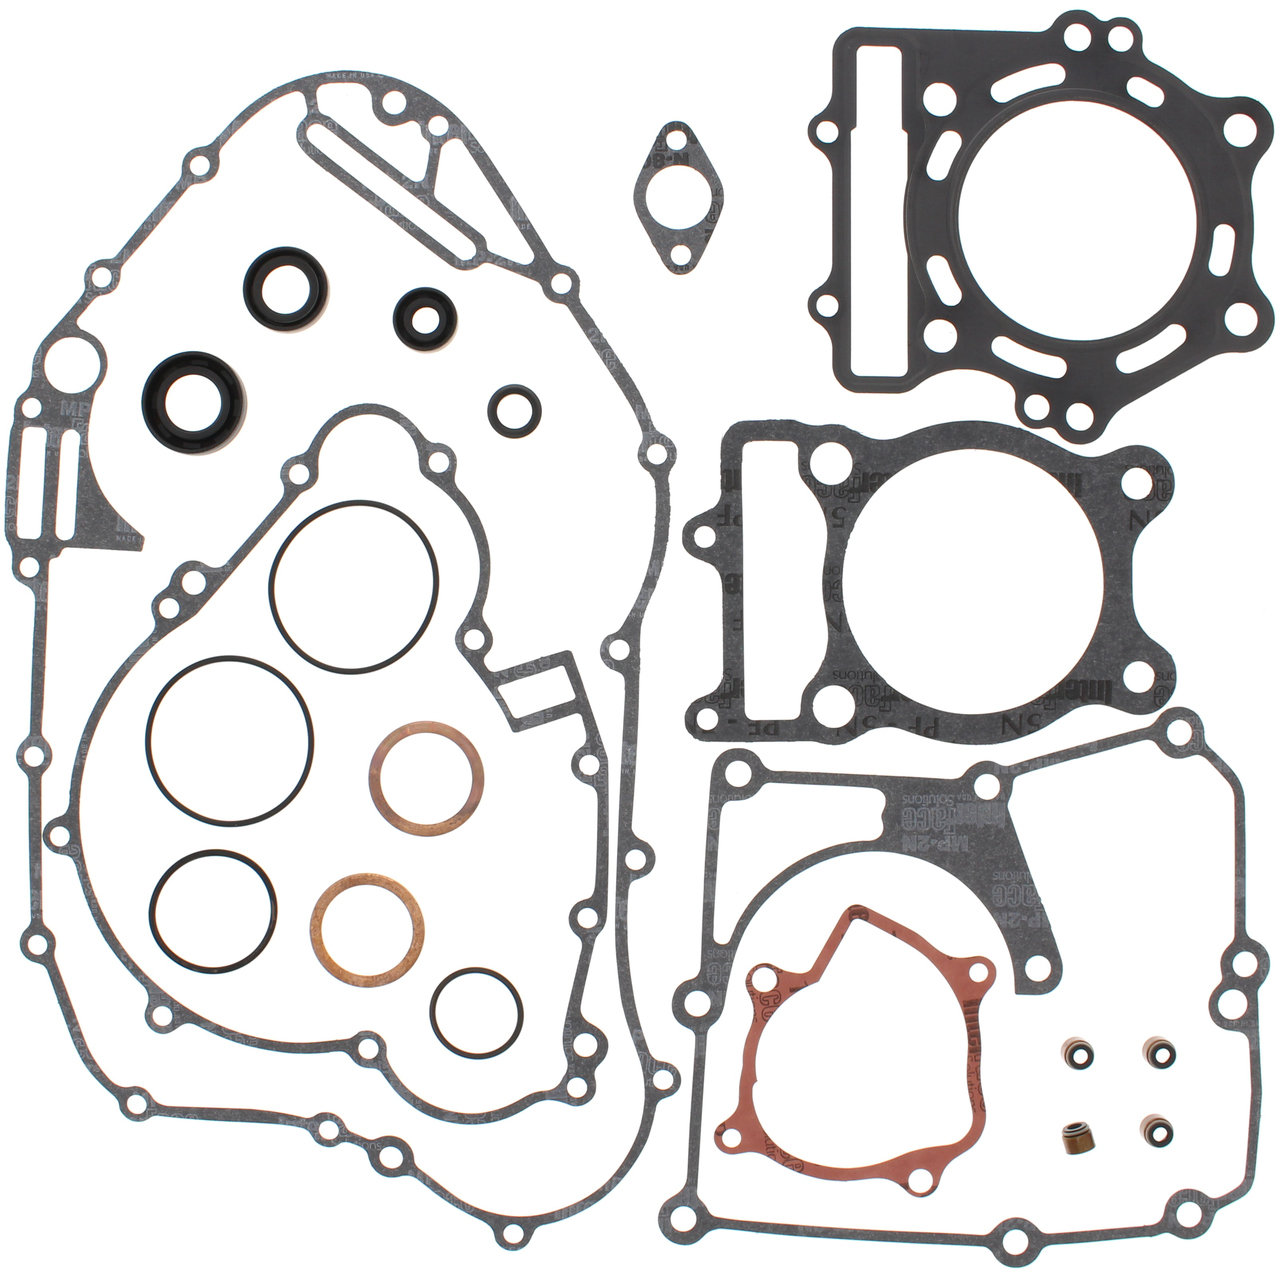 Complete Gasket Kit W Oil Seals Kawasaki Klf400 Bayou